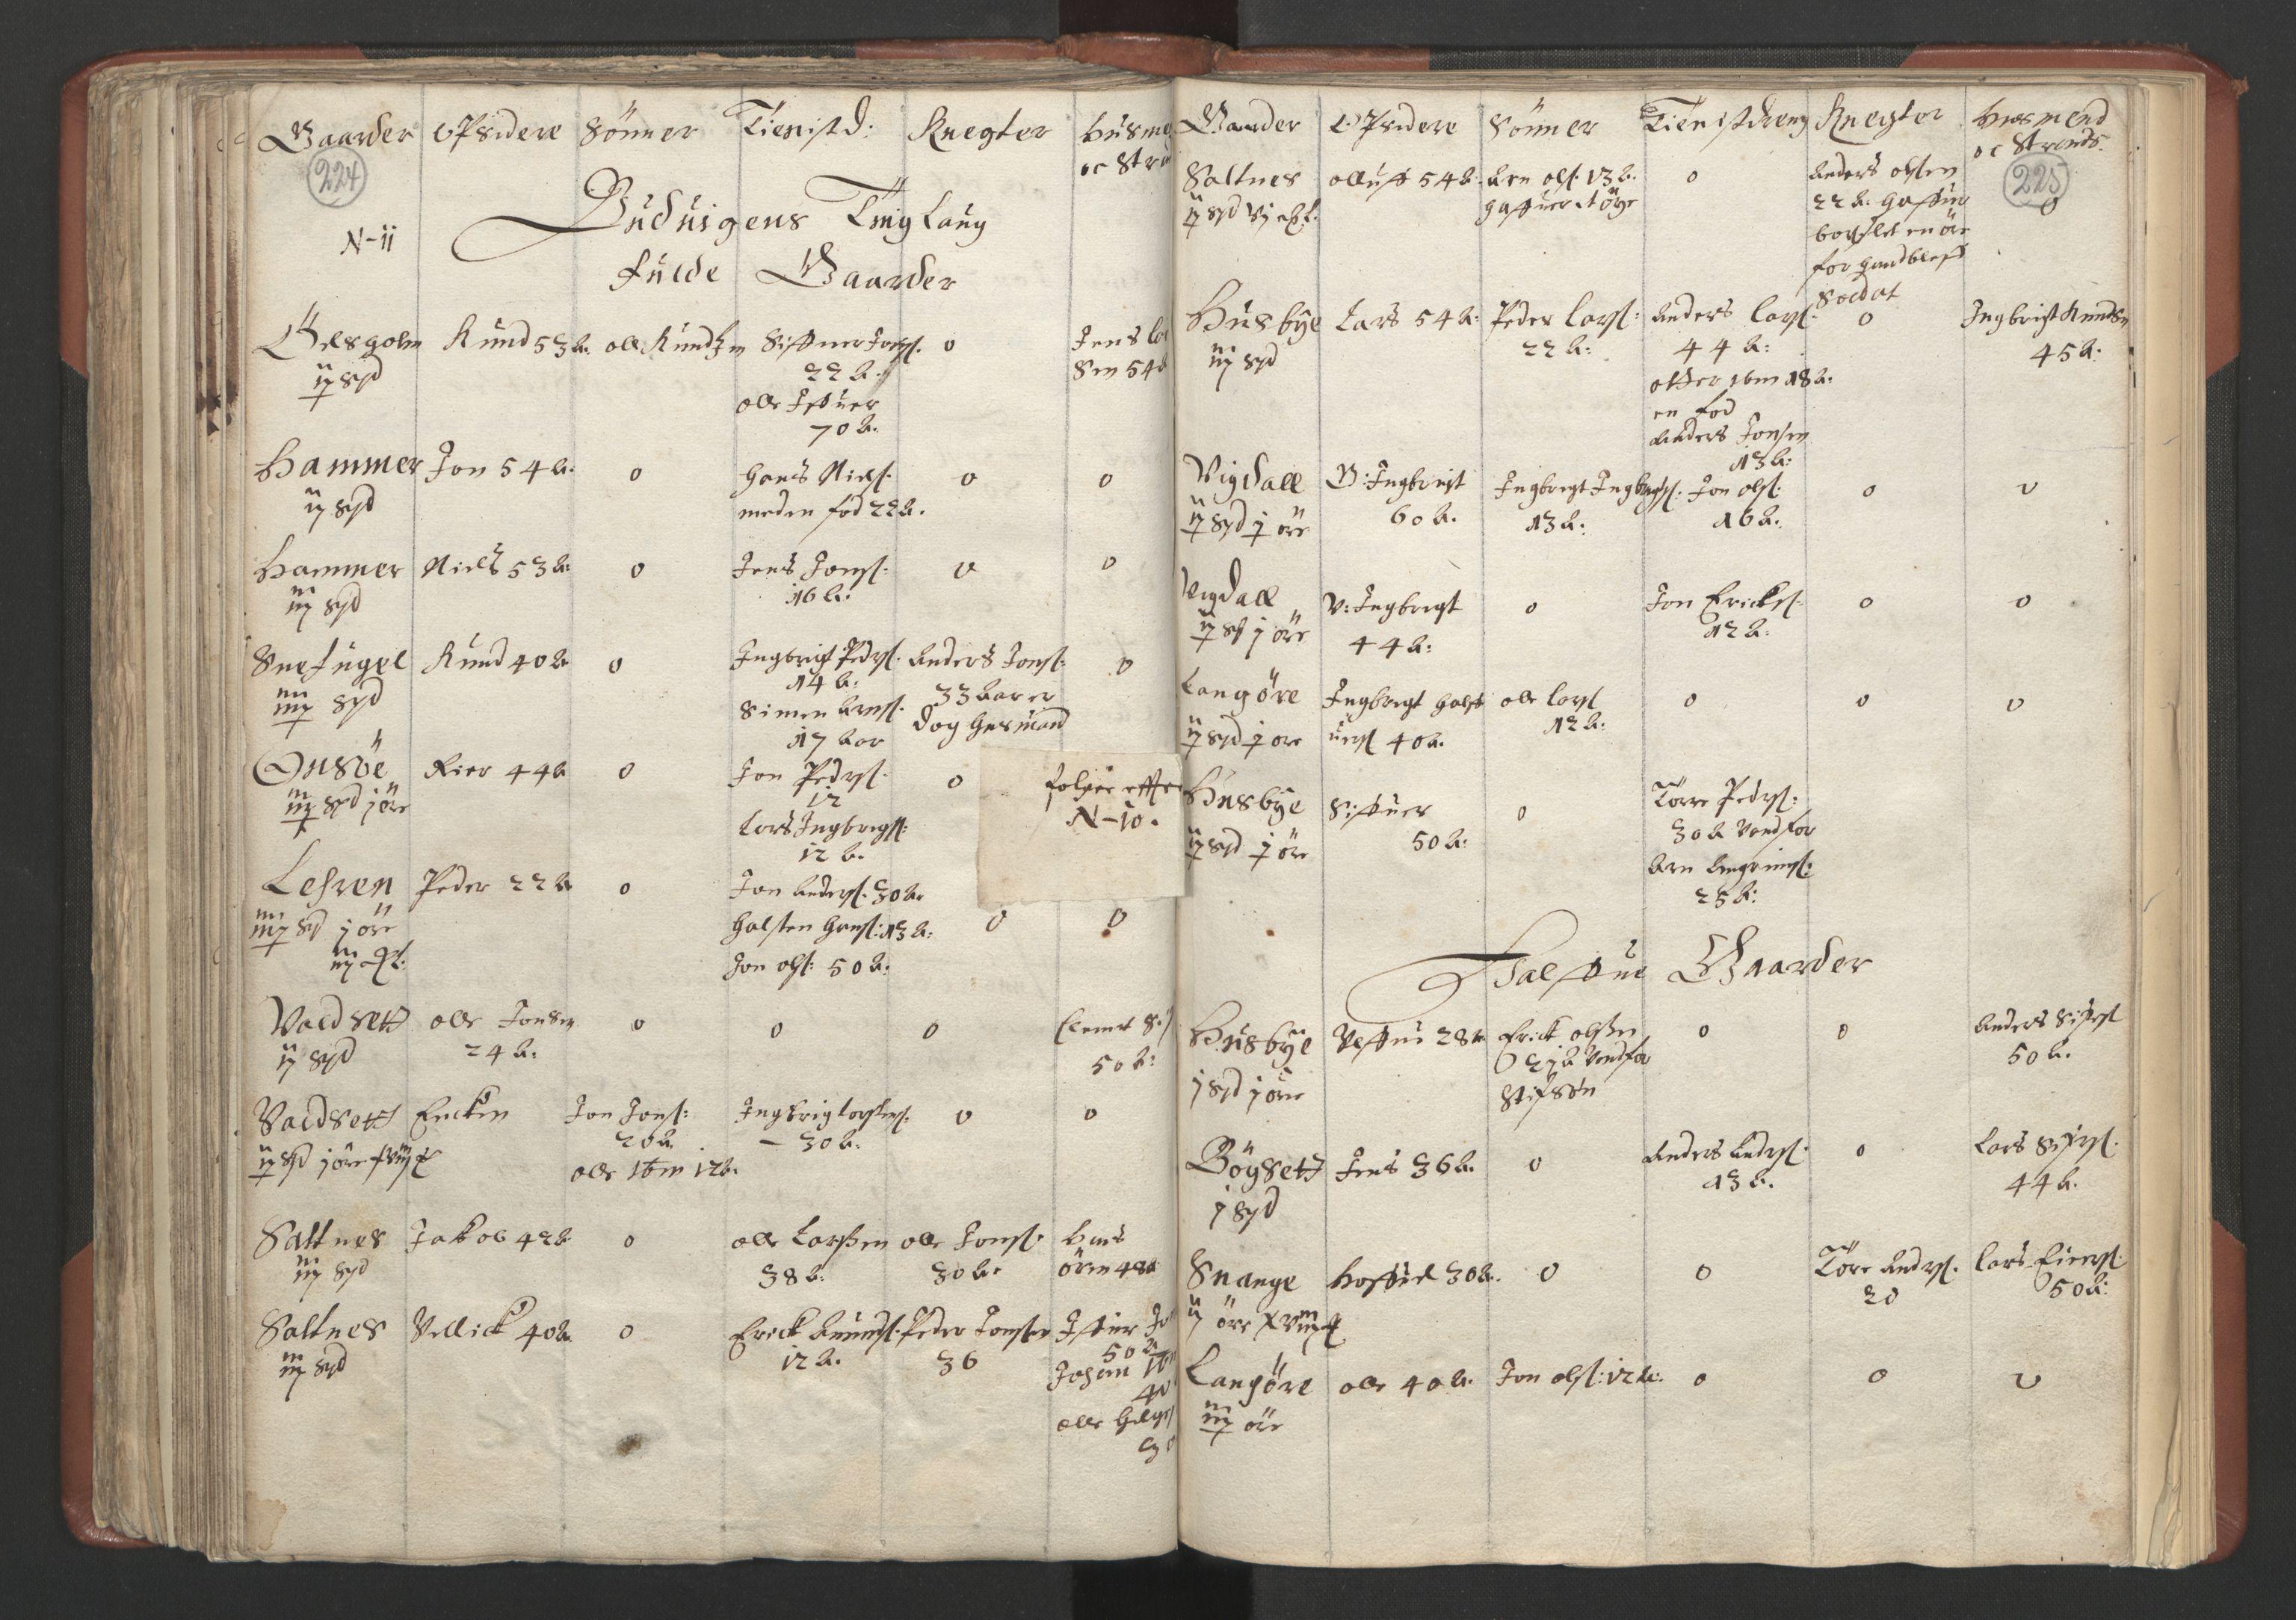 RA, Fogdenes og sorenskrivernes manntall 1664-1666, nr. 18: Gauldal fogderi, Strinda fogderi og Orkdal fogderi, 1664, s. 224-225